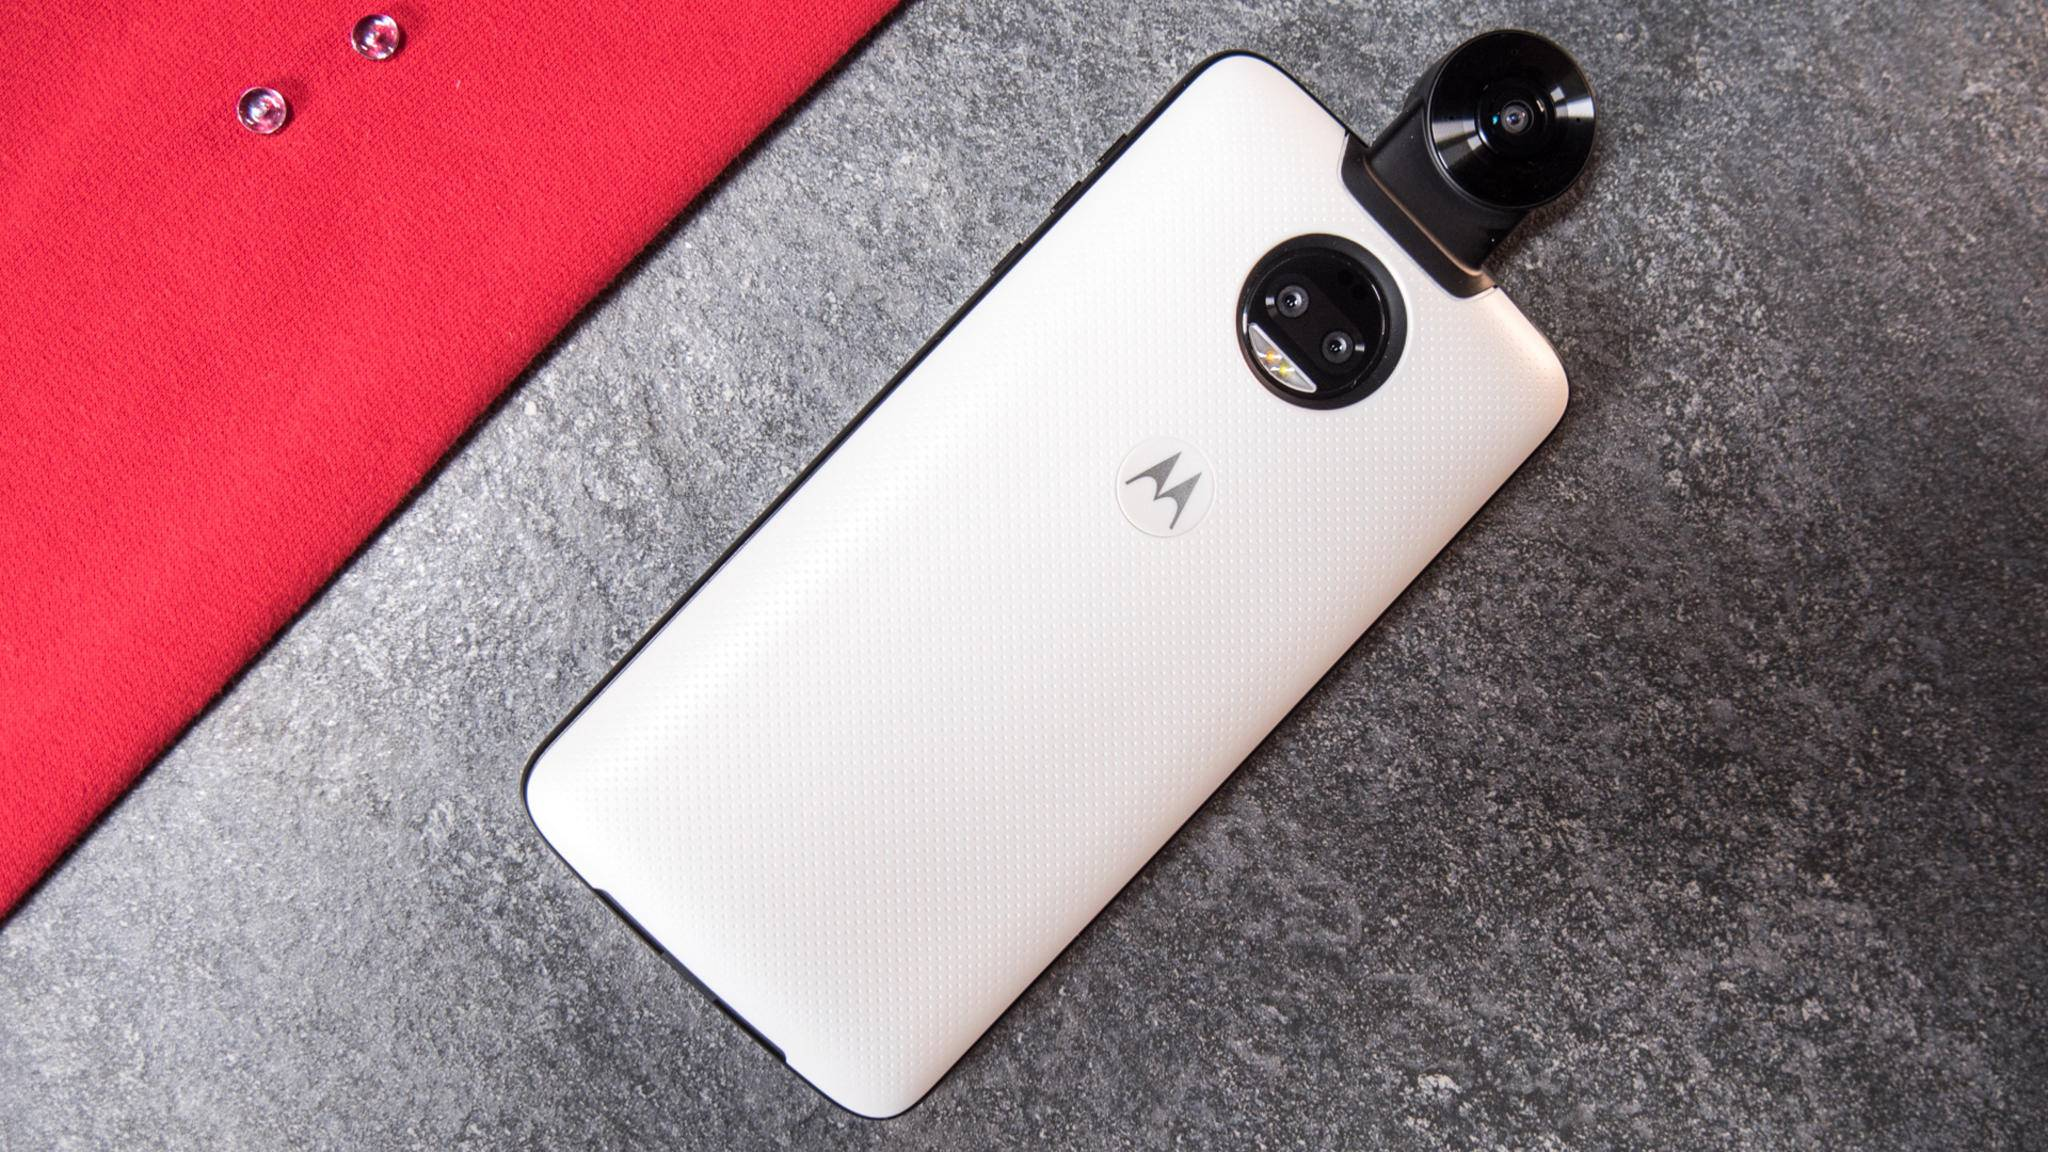 Mit dem Moto-360-Camera-Mod mutiert das Smartphone zur 360-Grad-Kamera.